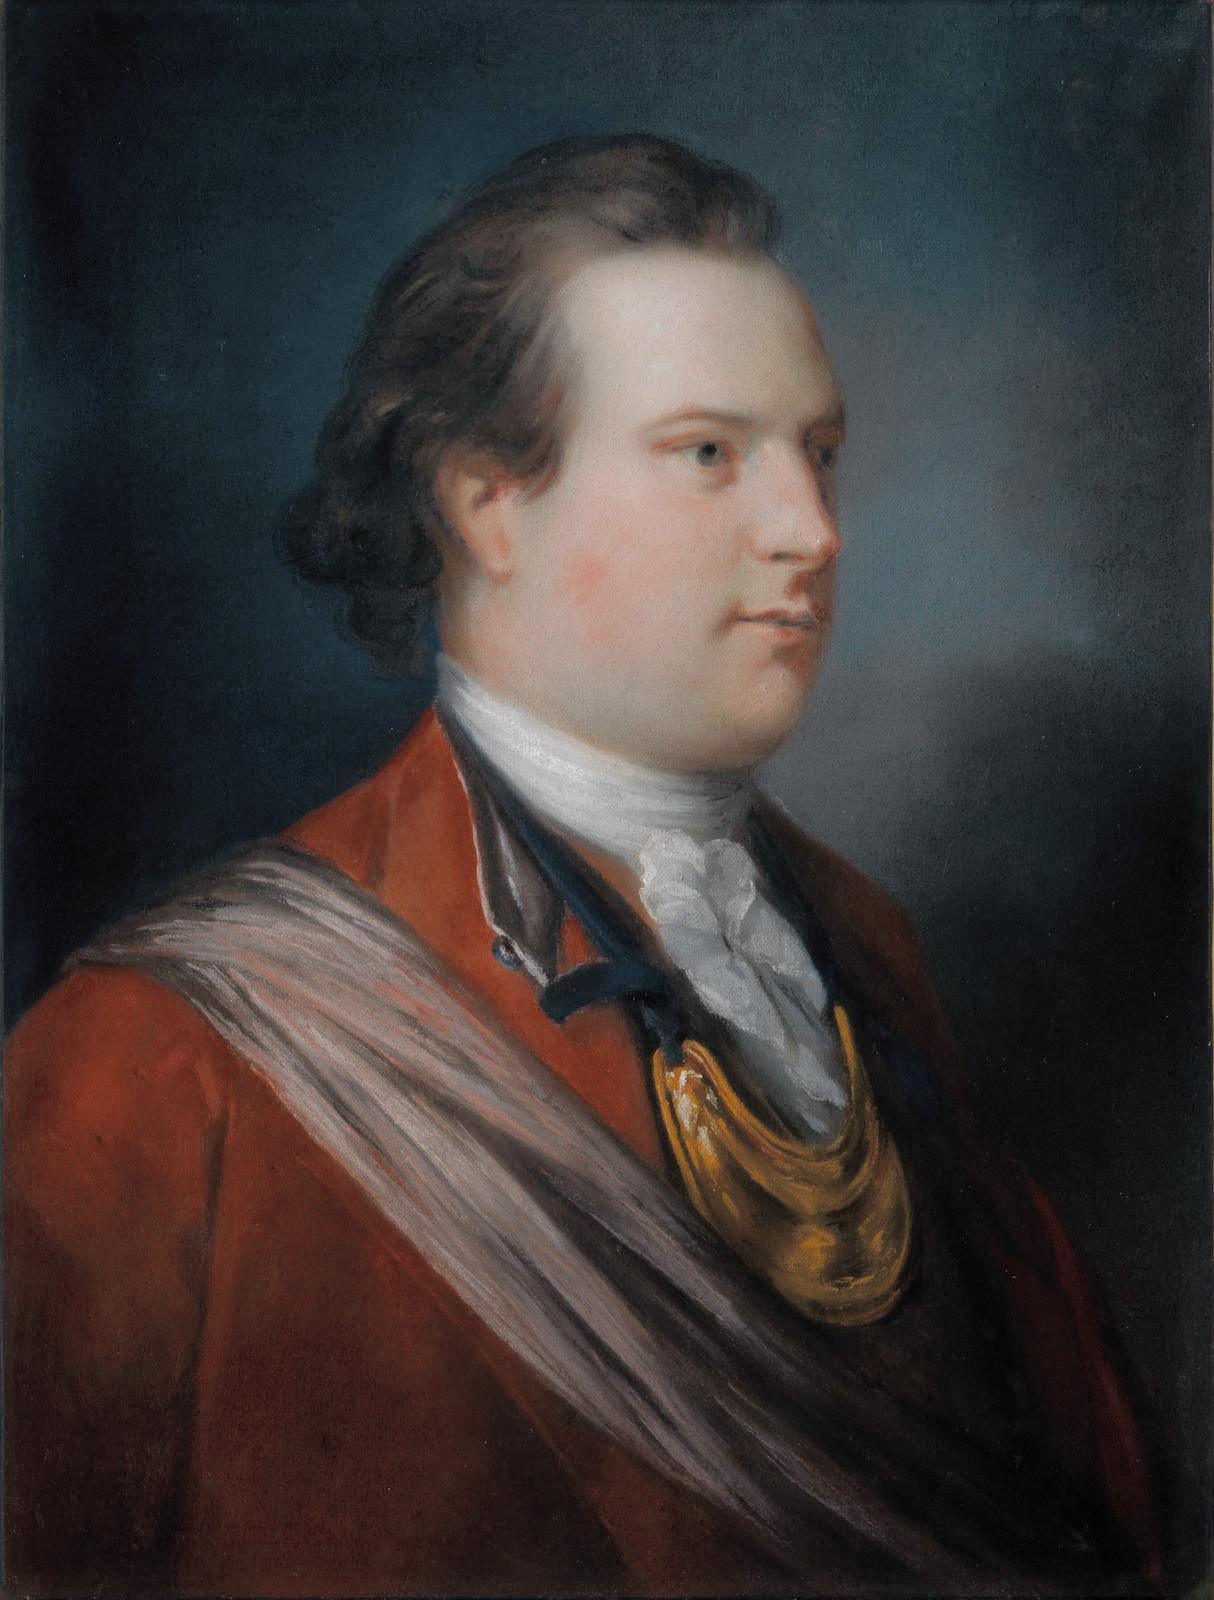 George Keppel, 3rd Earl of Albemarle - Wikipedia